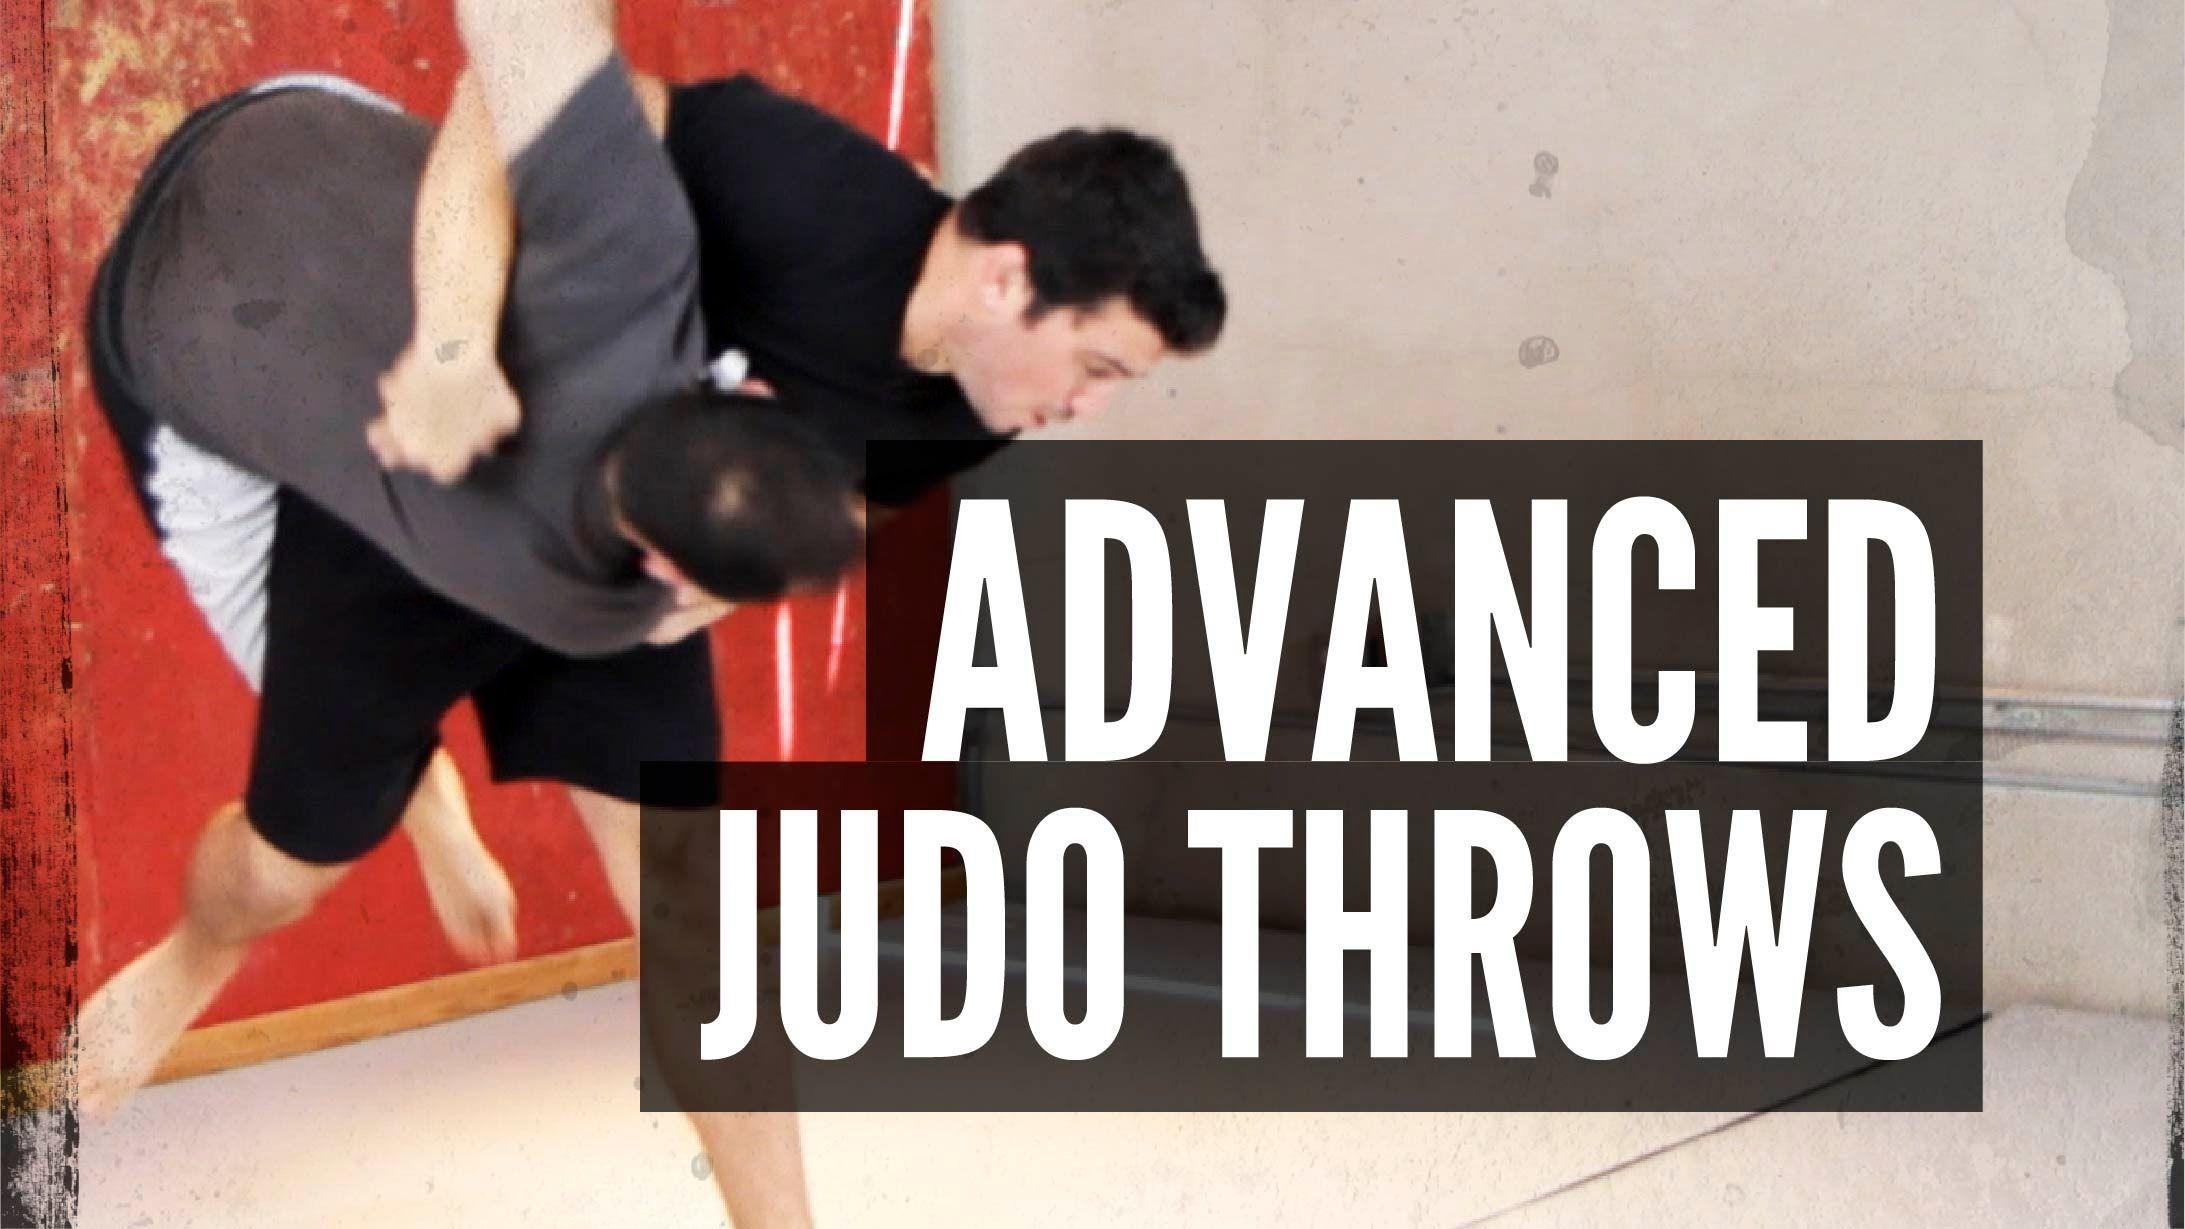 Advanced judo throws for mixed martial arts mixed